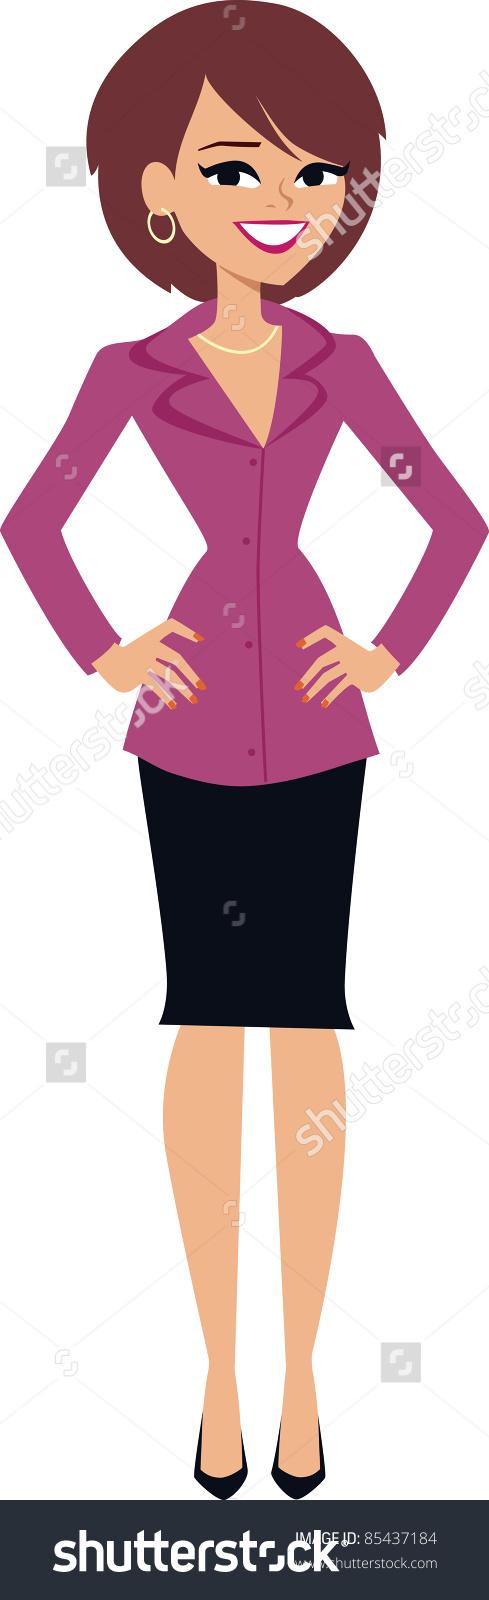 Woman clipart Art woman Clip Clipart Woman